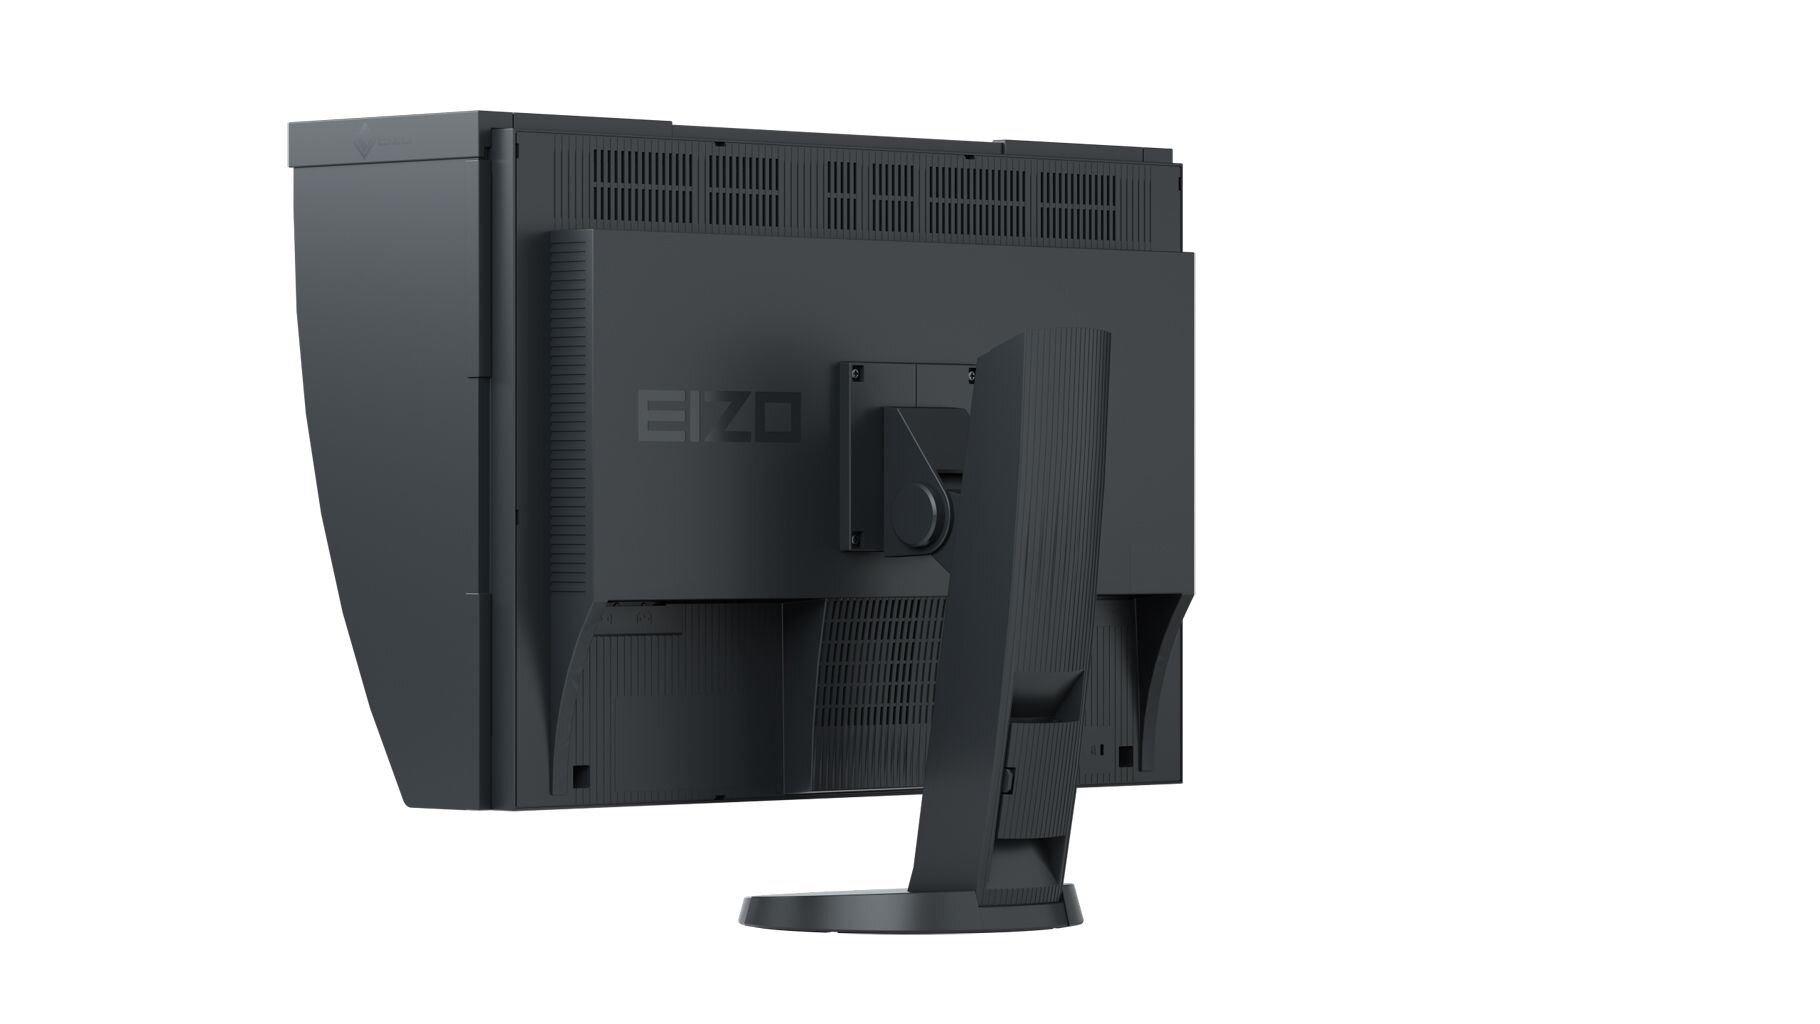 EIZO ColorEdge CG247X 24,1 Zoll Monitor schwarz / 61,1cm / 1920 x 1200 / IPS (Wide Gamut)